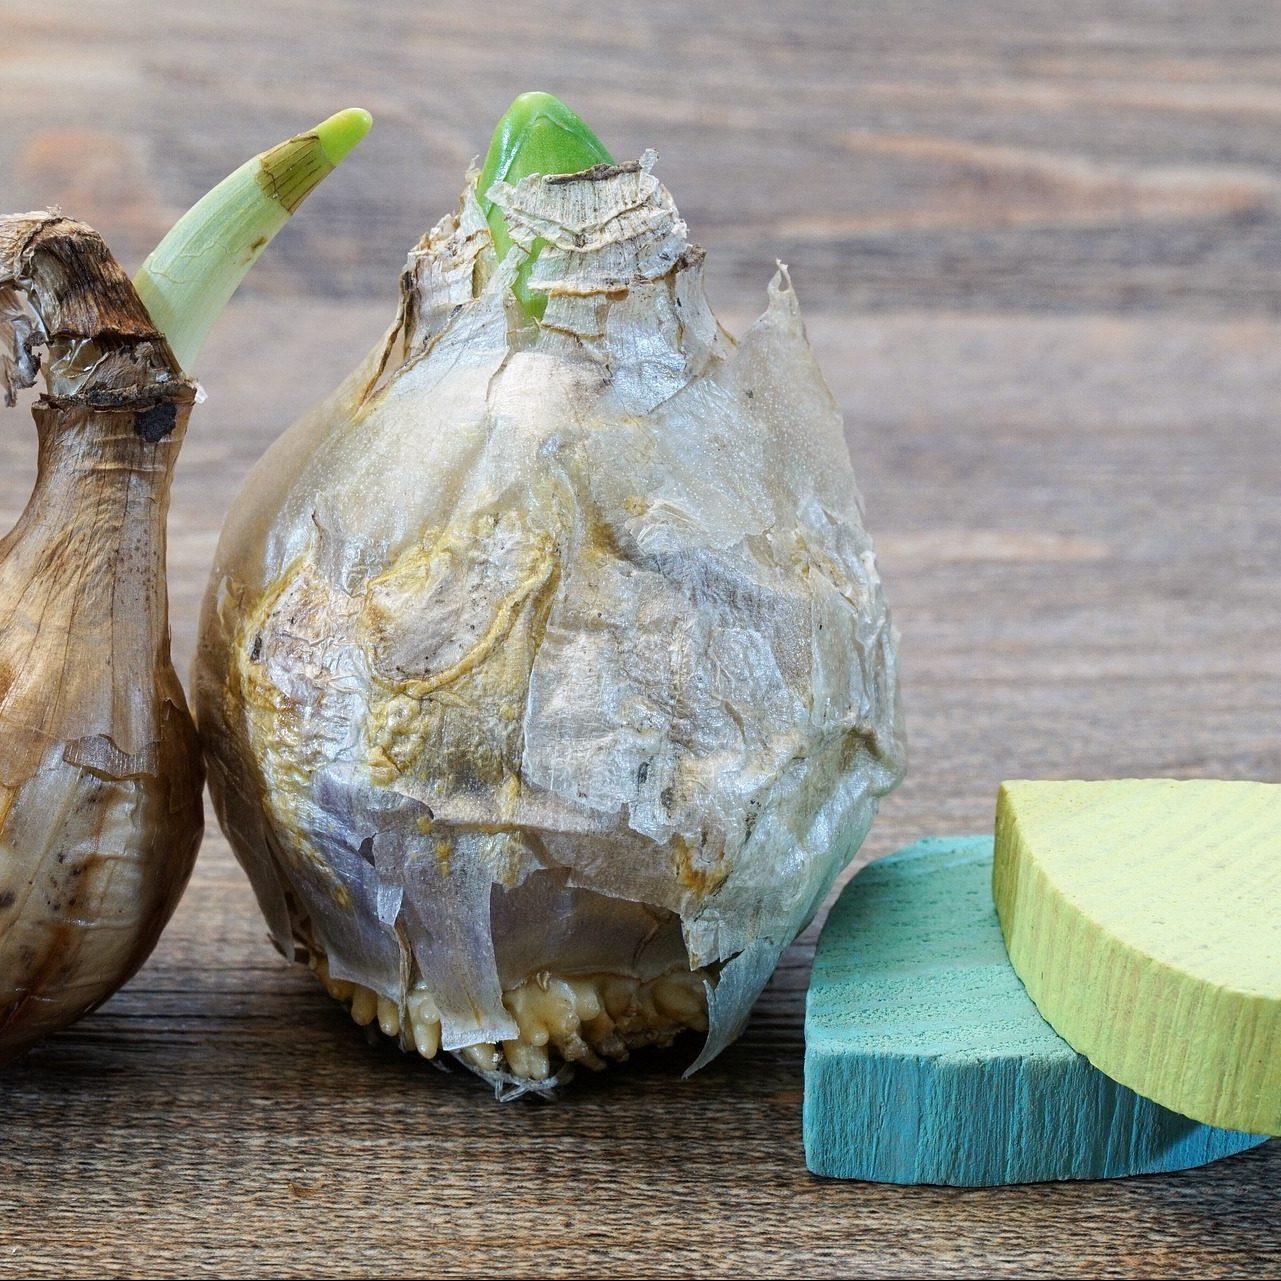 Zwiebelpflanze-Angebot-3